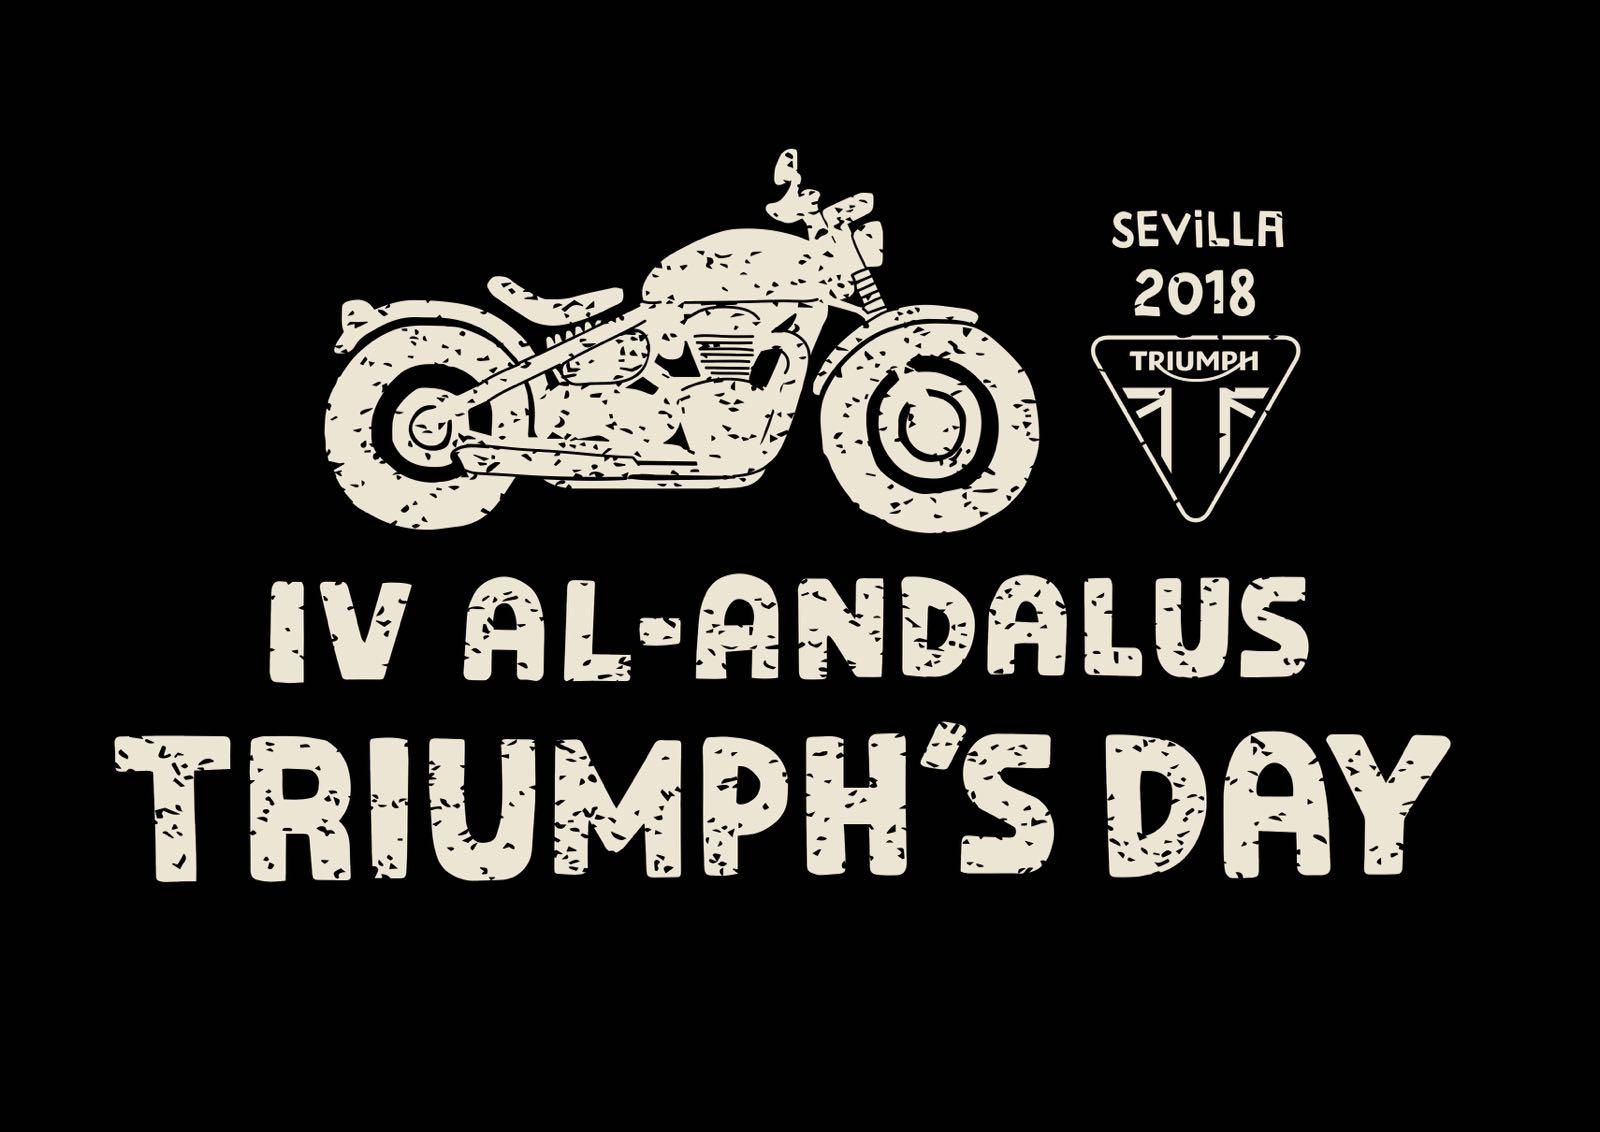 IV Al Andalus Triumph Day | Talleres El Venta